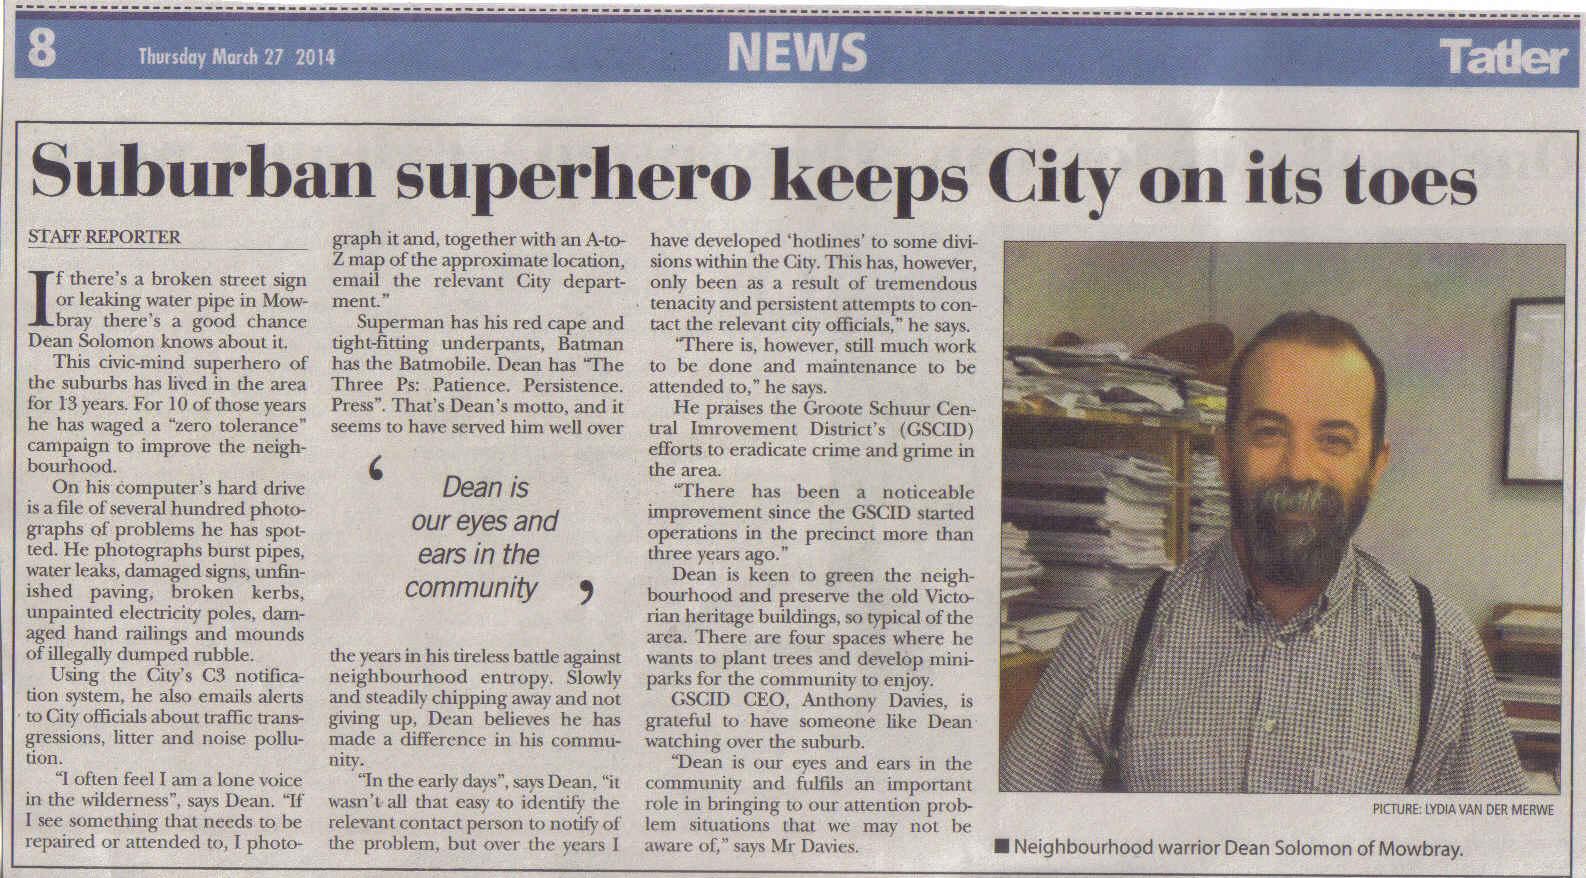 Suburban superhero keeps City on its toes (Thursday, 27 March 2014)